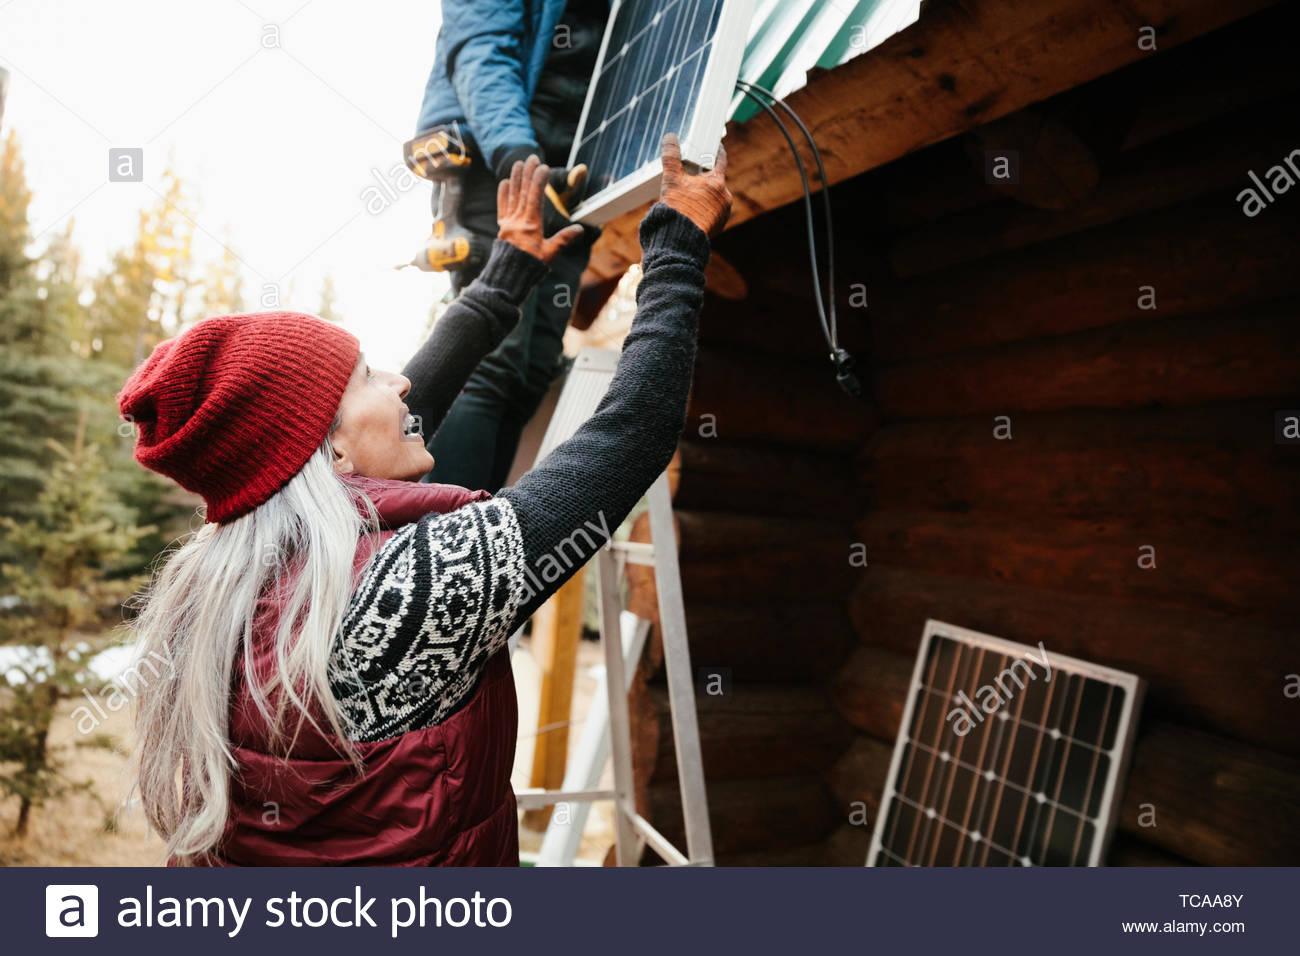 Happy woman installing solar panels on cabin - Stock Image